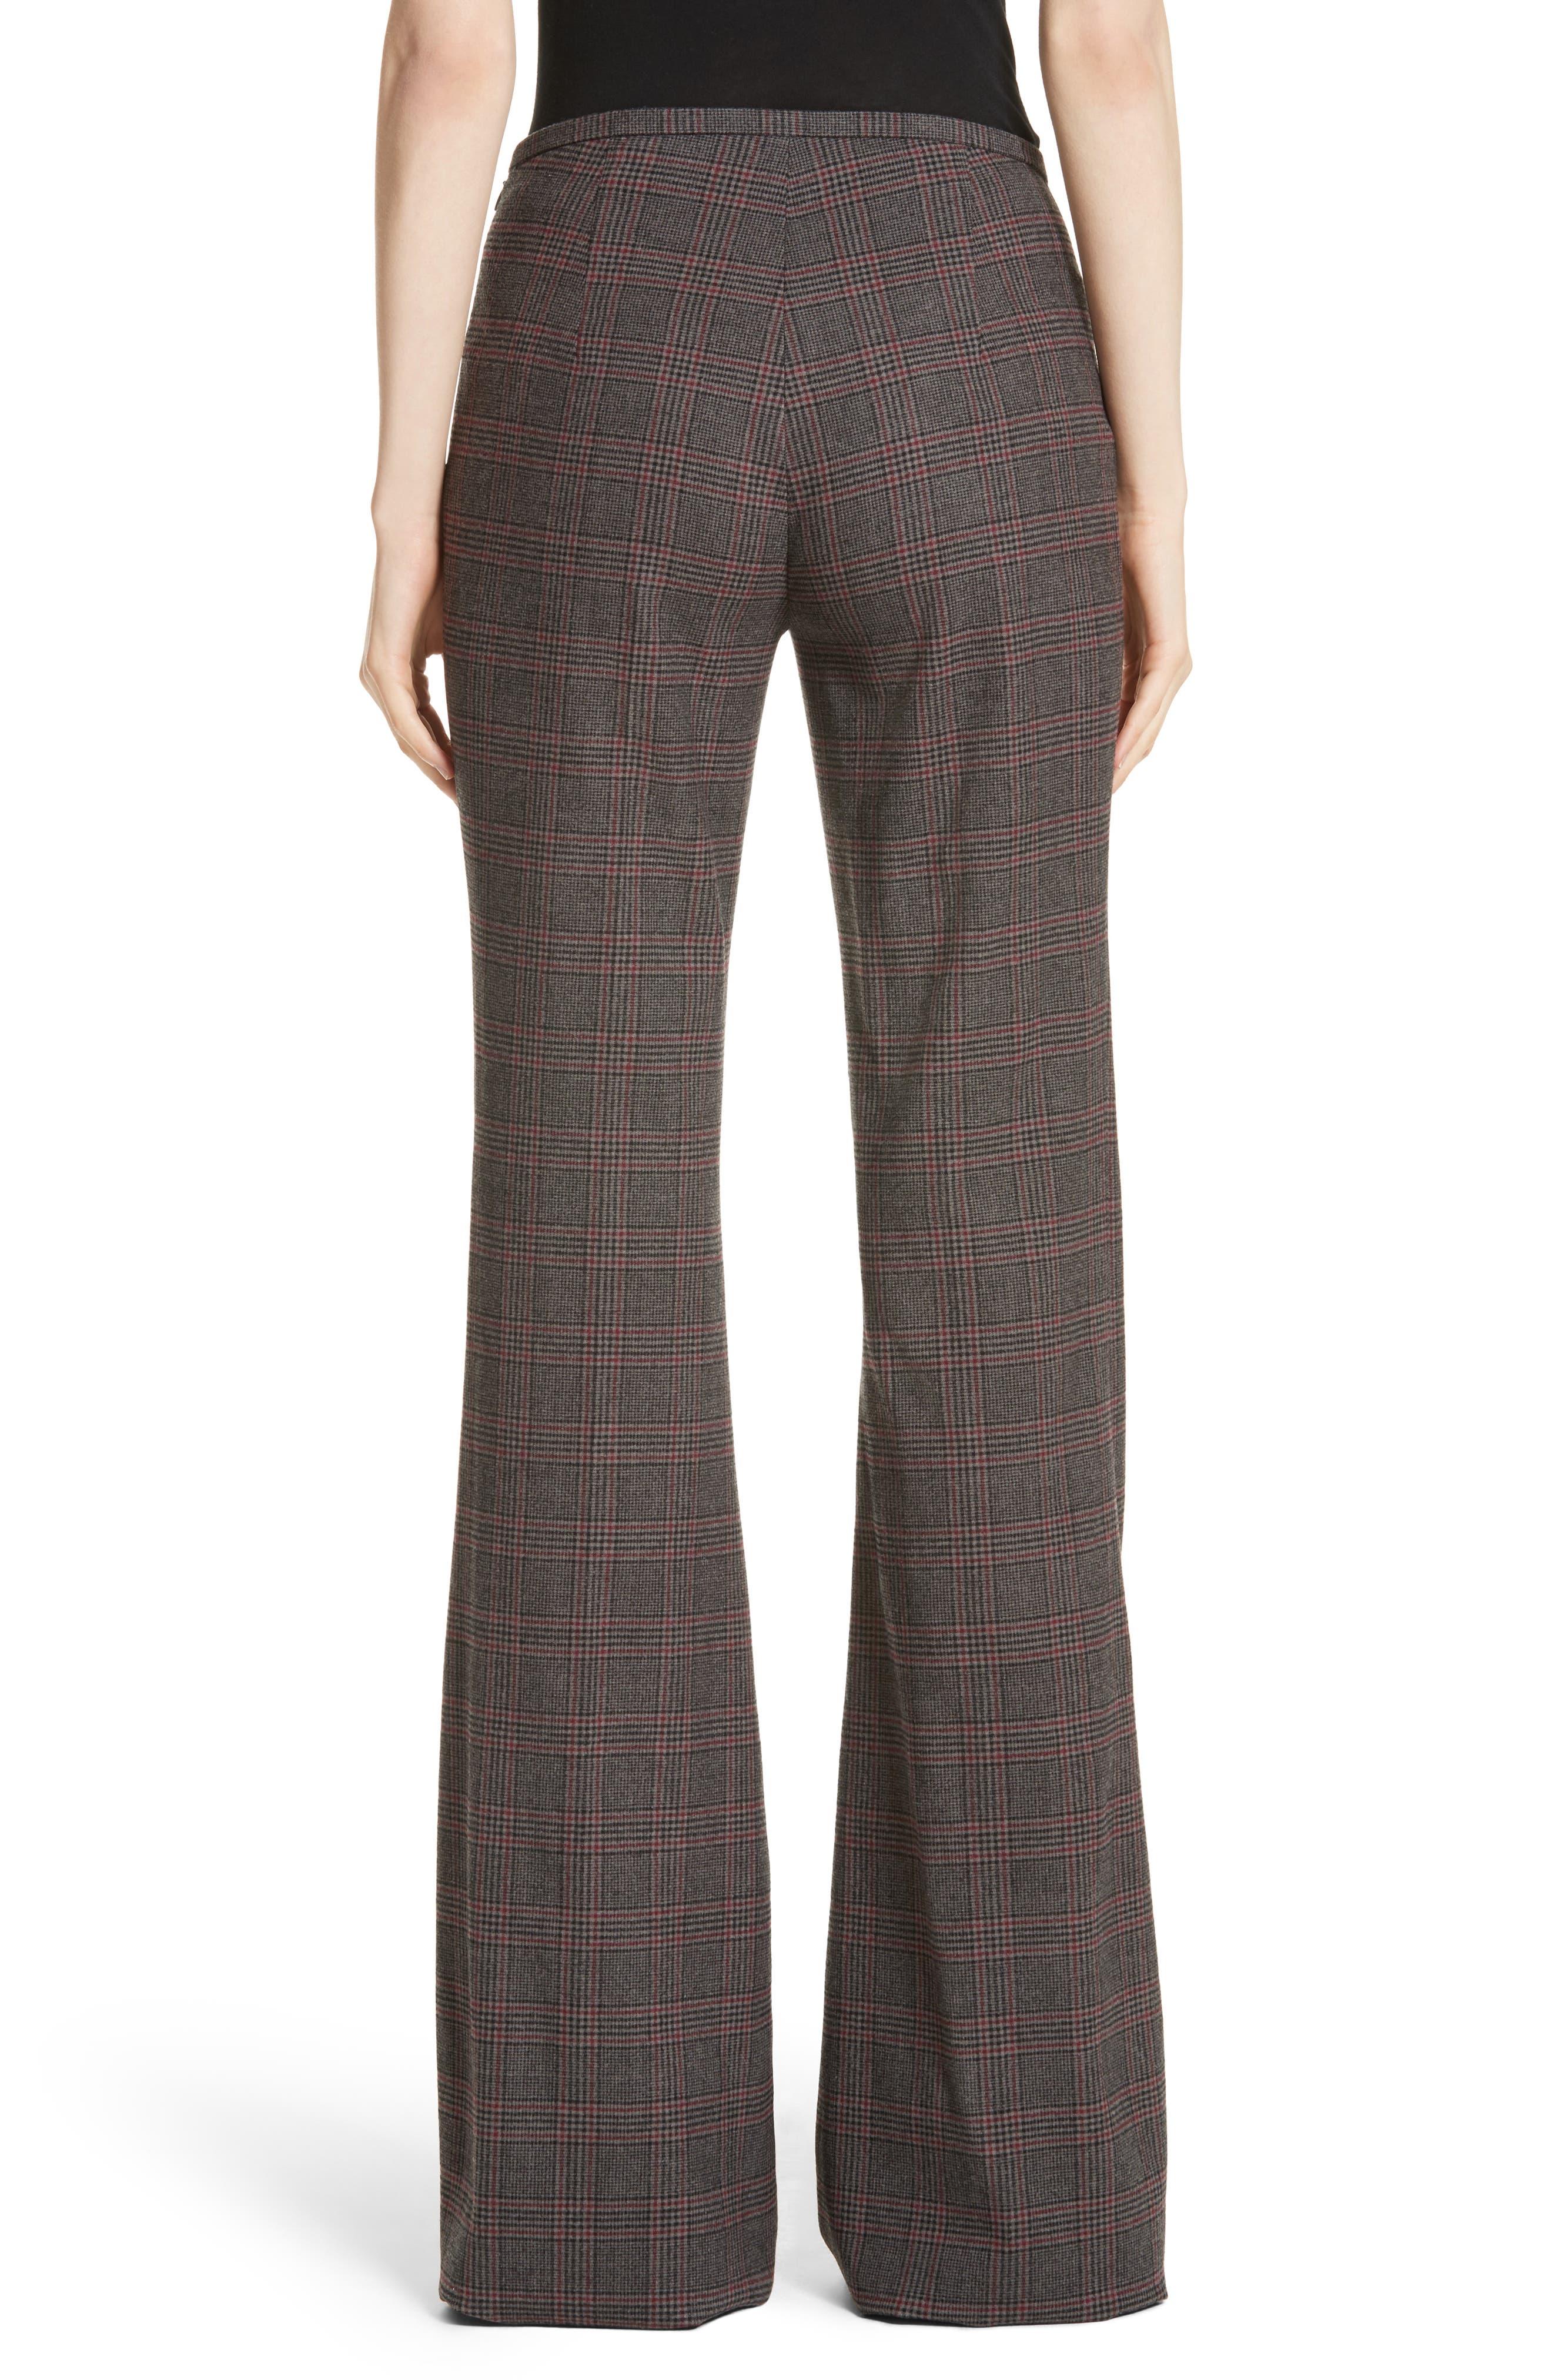 MICHAEL KORS,                             Plaid Stretch Wool Flannel Pants,                             Alternate thumbnail 2, color,                             034